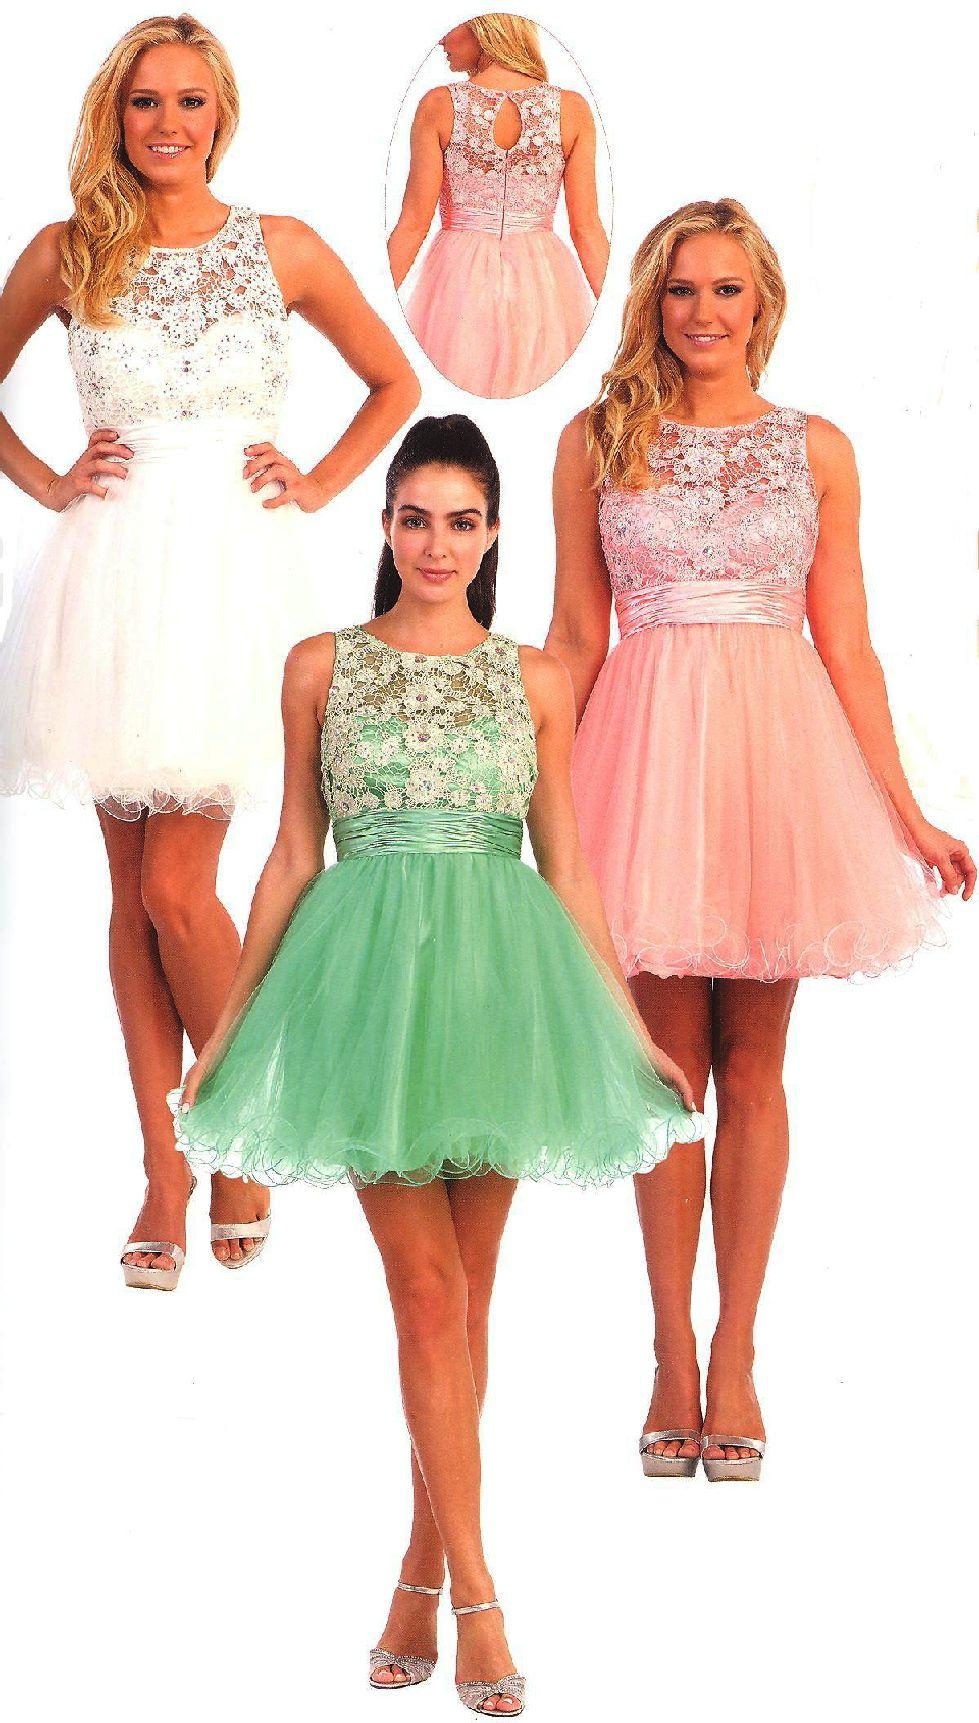 Prom dresses sweet dre sses under ucbrueucbrueshort dress